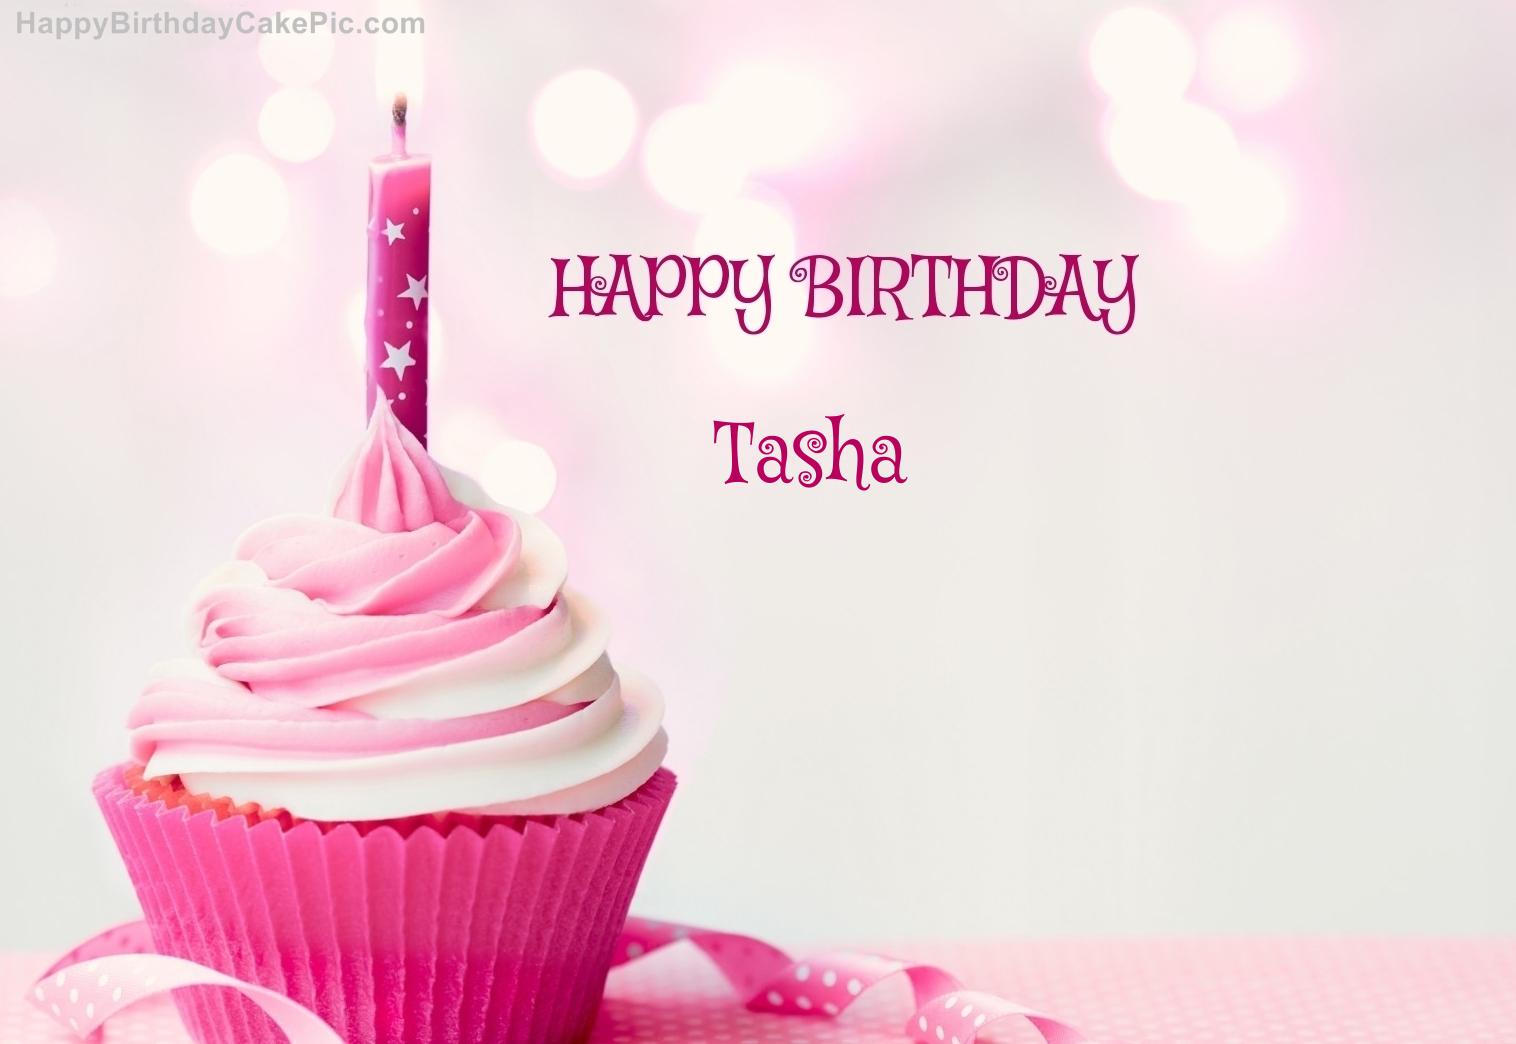 Happy Birthday Tasha Cake Images